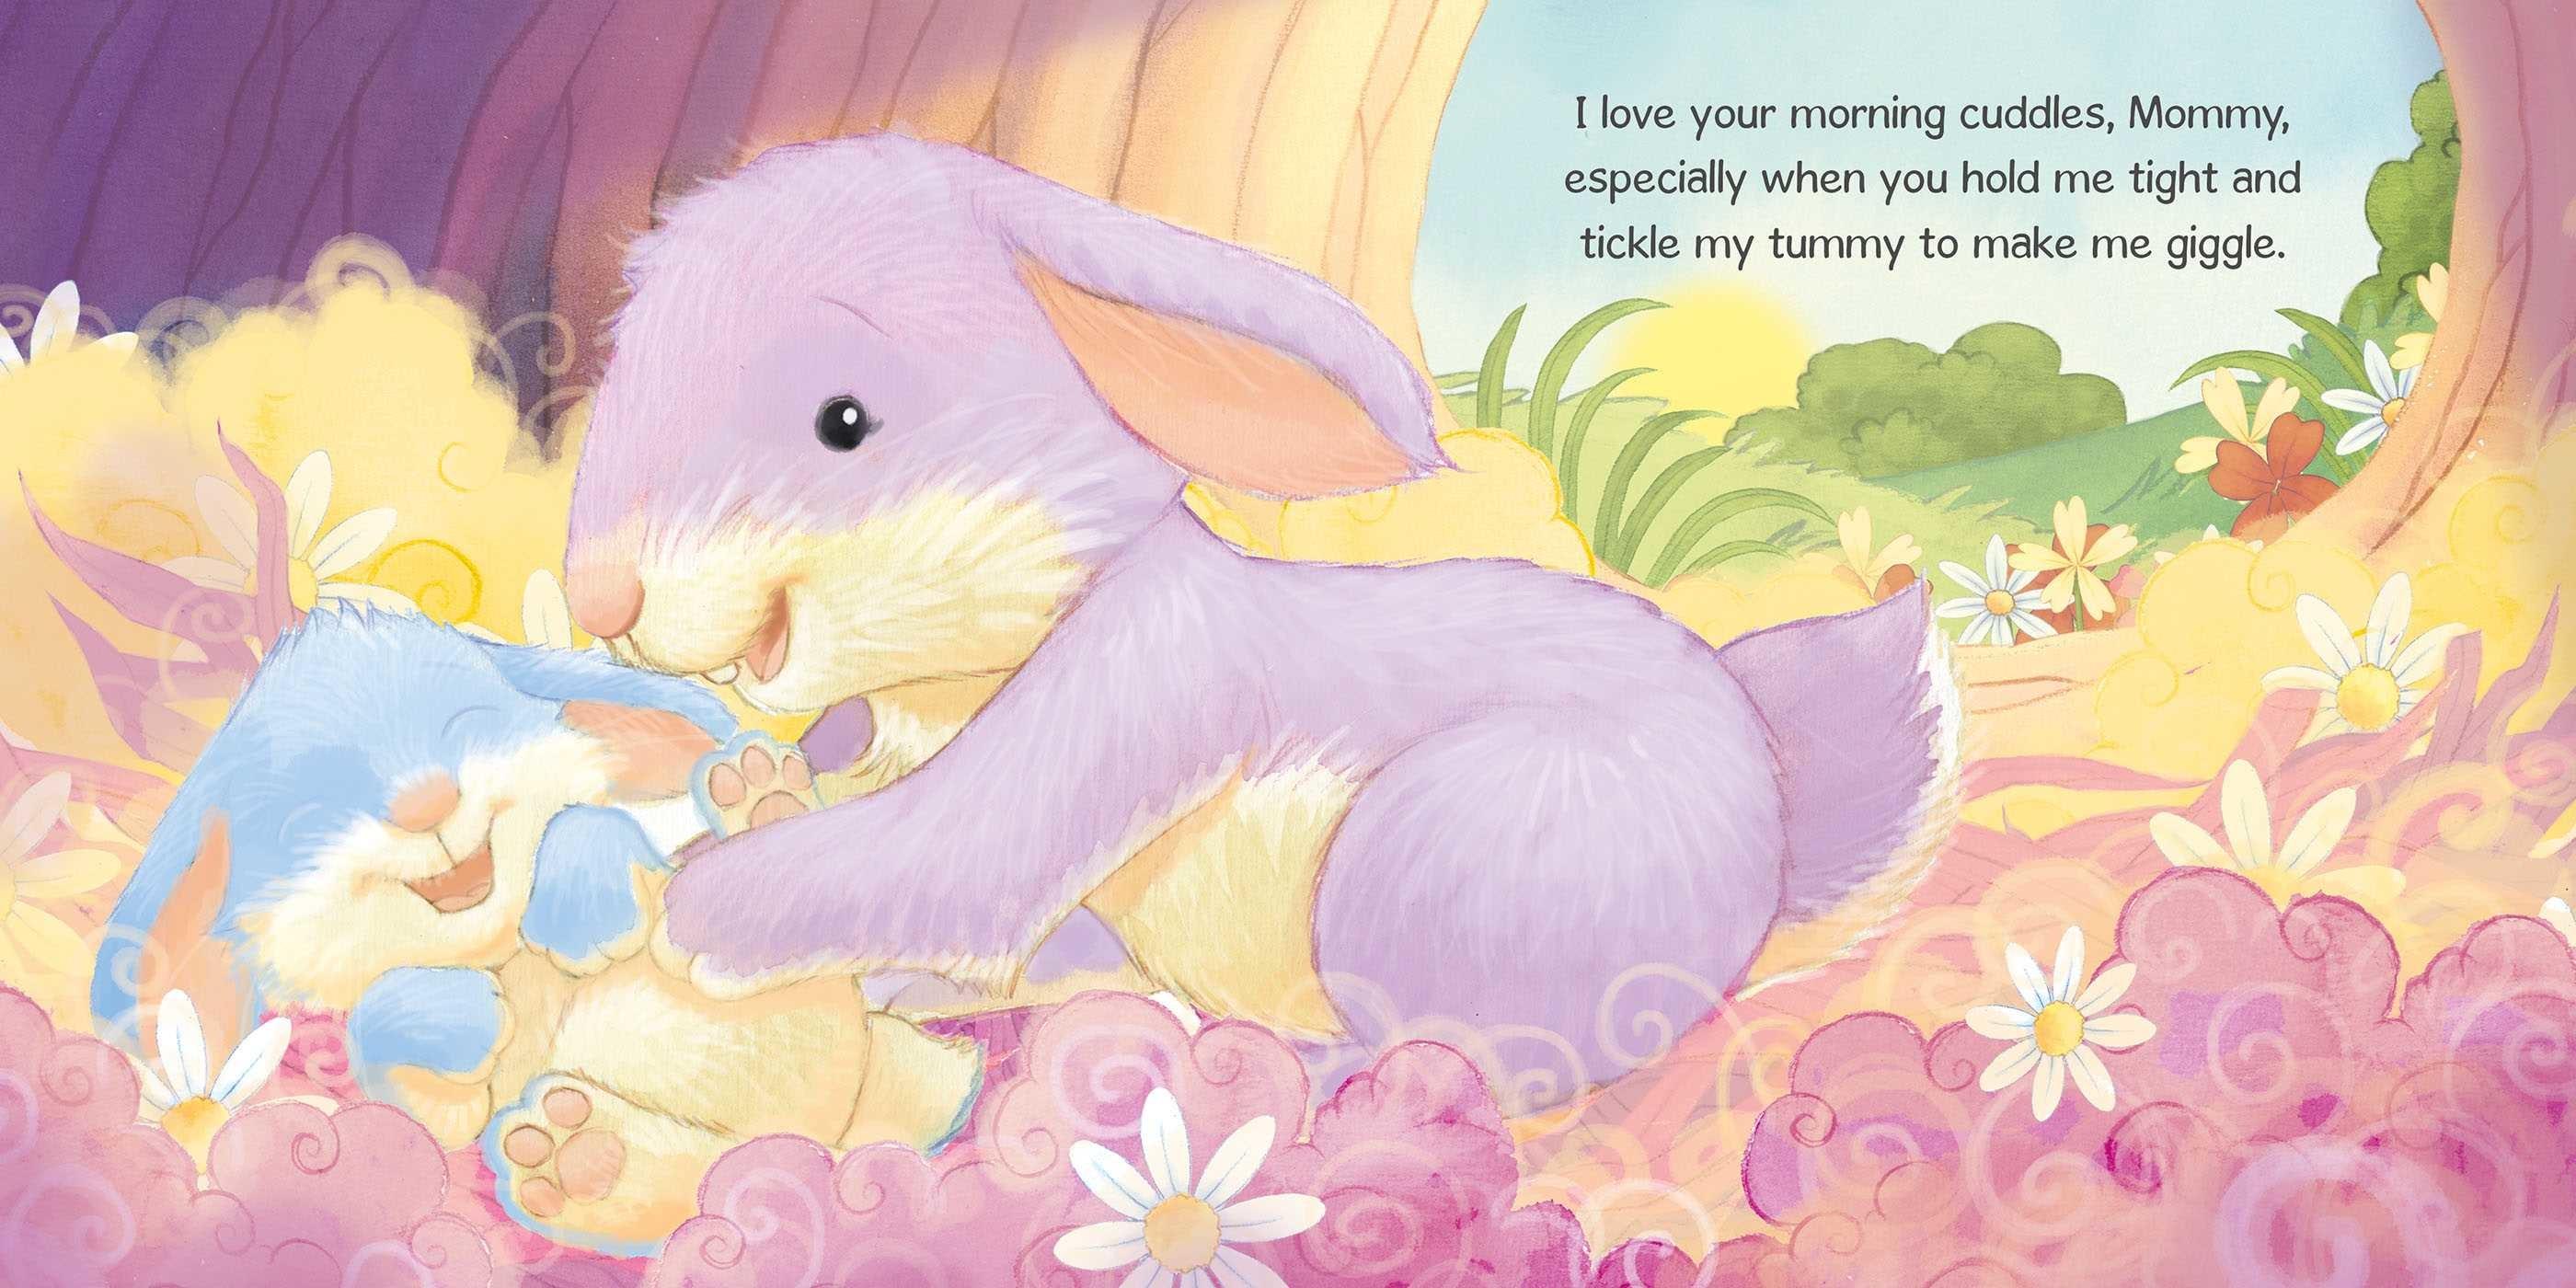 Mommy cuddles 9781499880489.in01